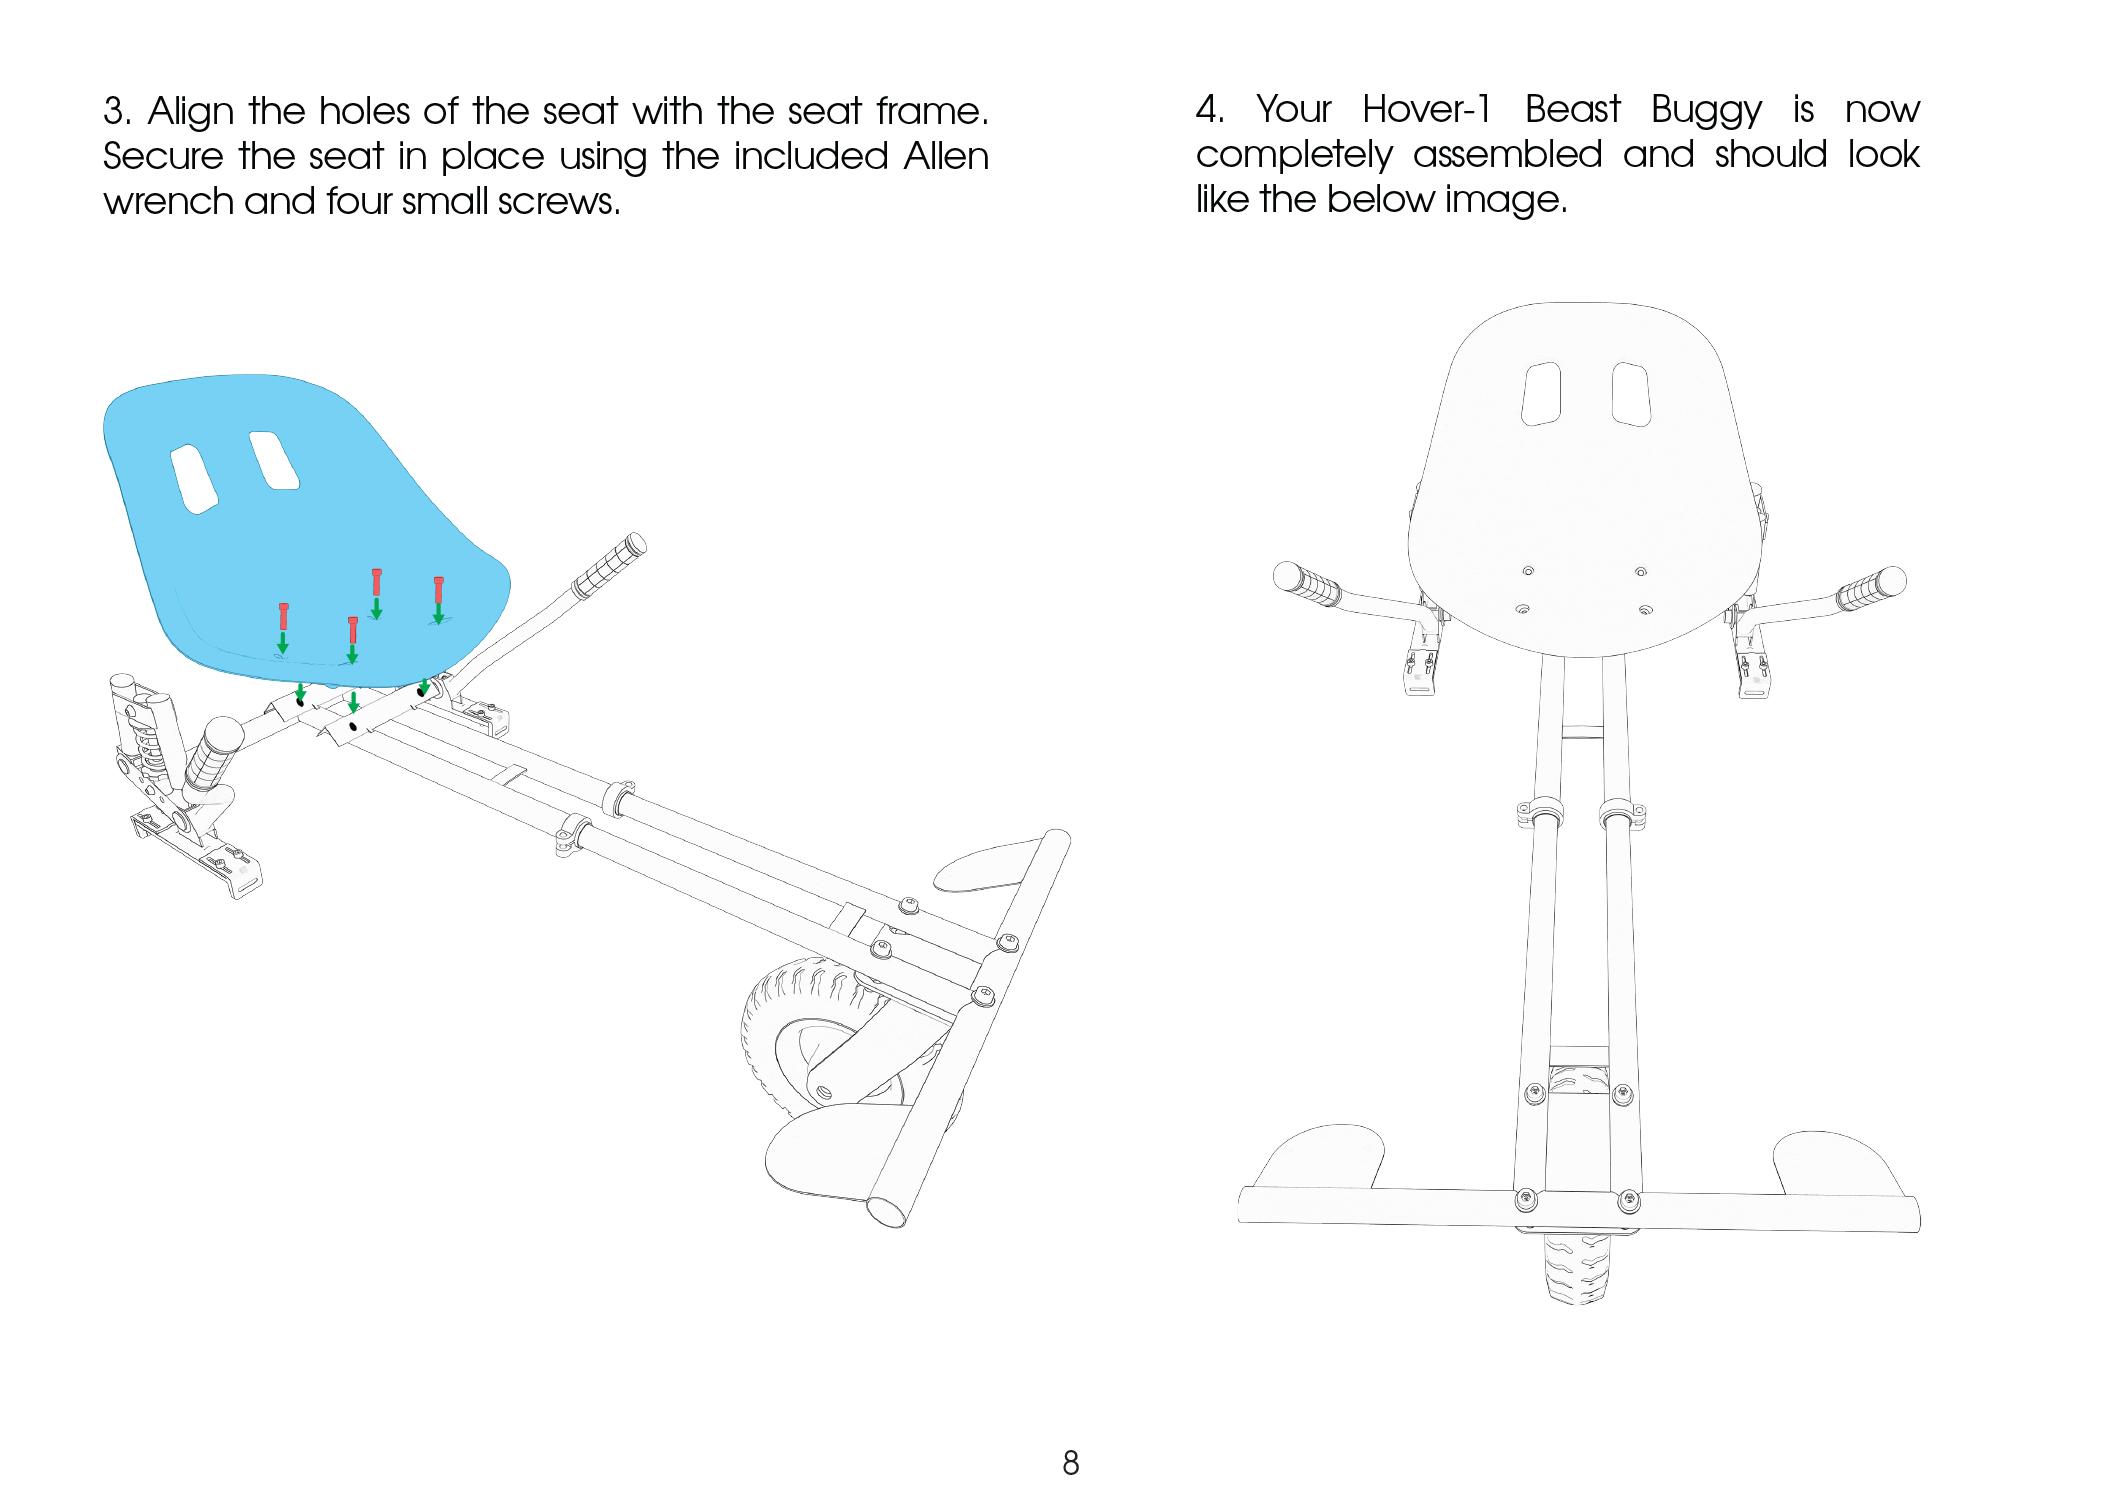 HY-BST-BGY-Manual-04232018-9.jpg